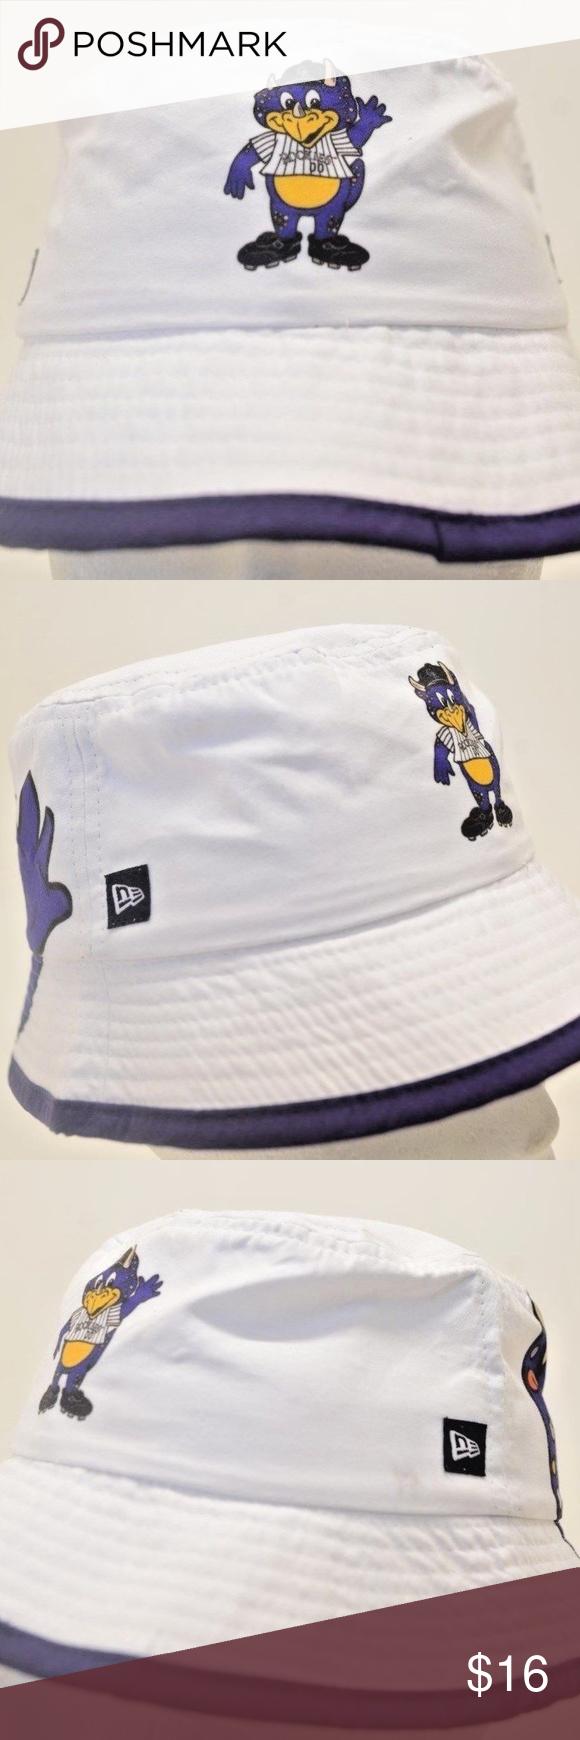 e0c3ec07 Toddler New Era Colorado Rockies Bucket Hat NEW! MLB Youth Colorado Rockies  Toddler New Era Bucket Hat Brand:New Era Size:TODDLER 100% Authentic Stock  #1829 ...